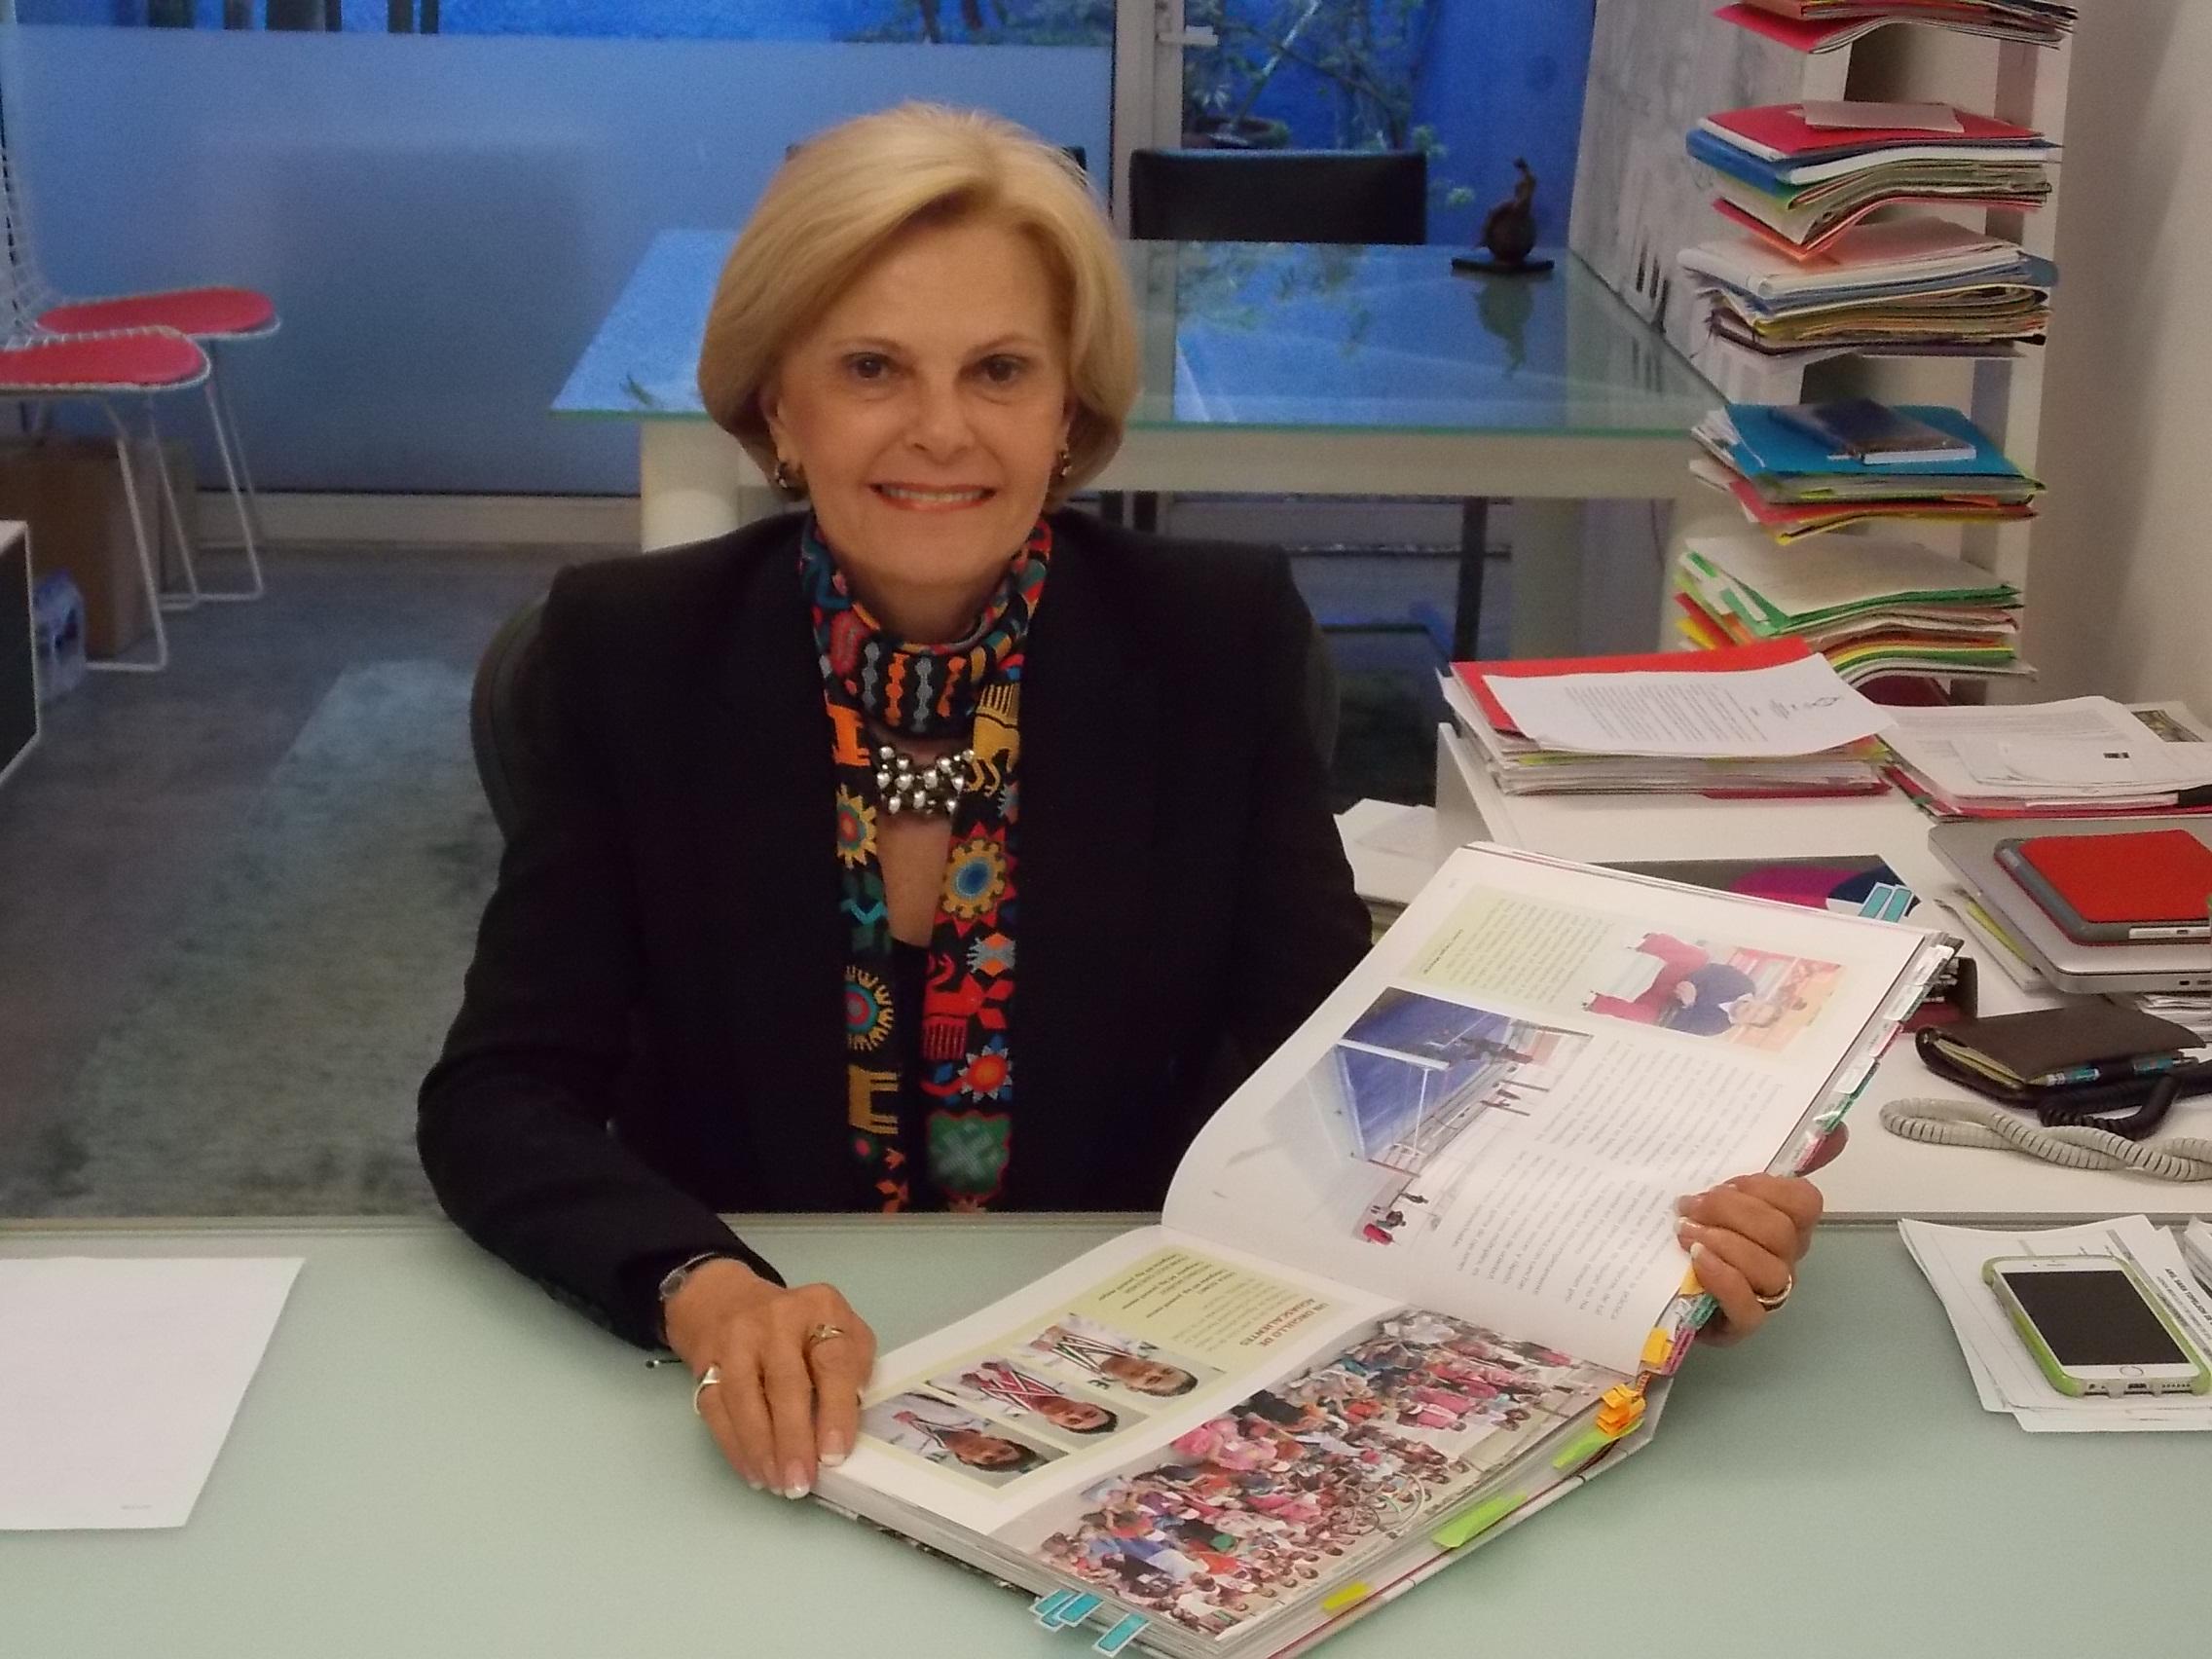 Sara Topelson